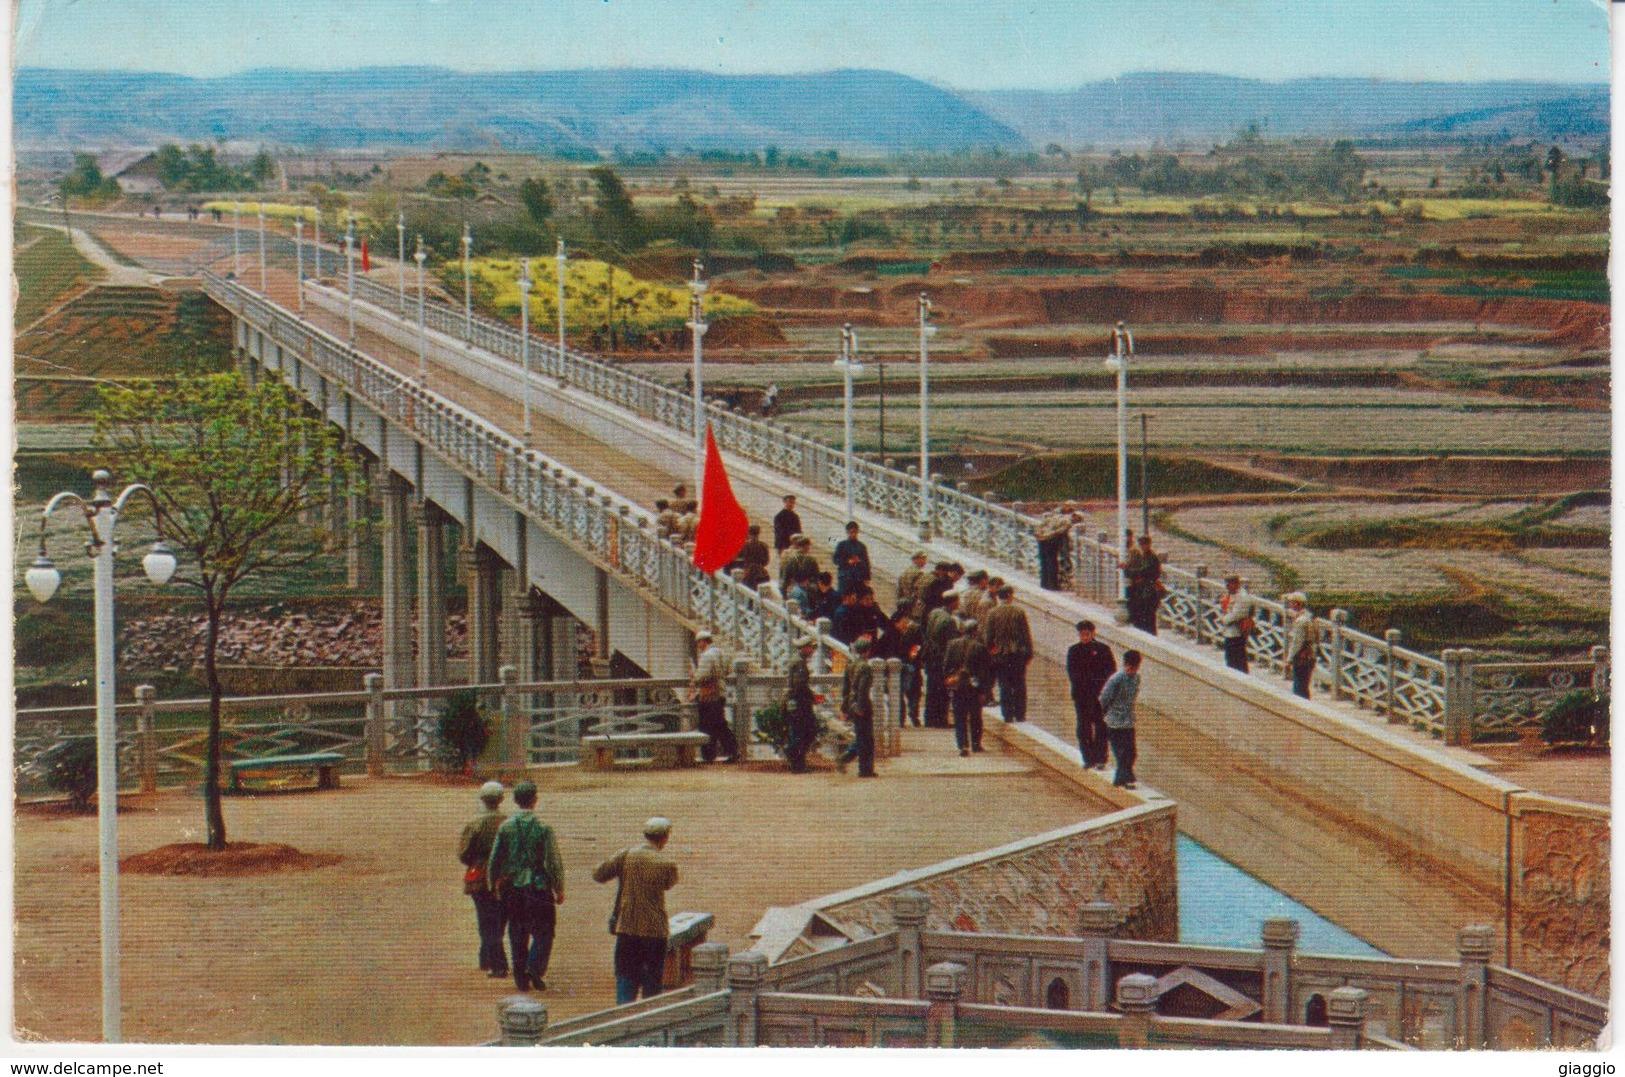 °°° 13491 - CHINA - SHAOSHAN - IRRIGATION CANAL - 1971 °°° - Cina